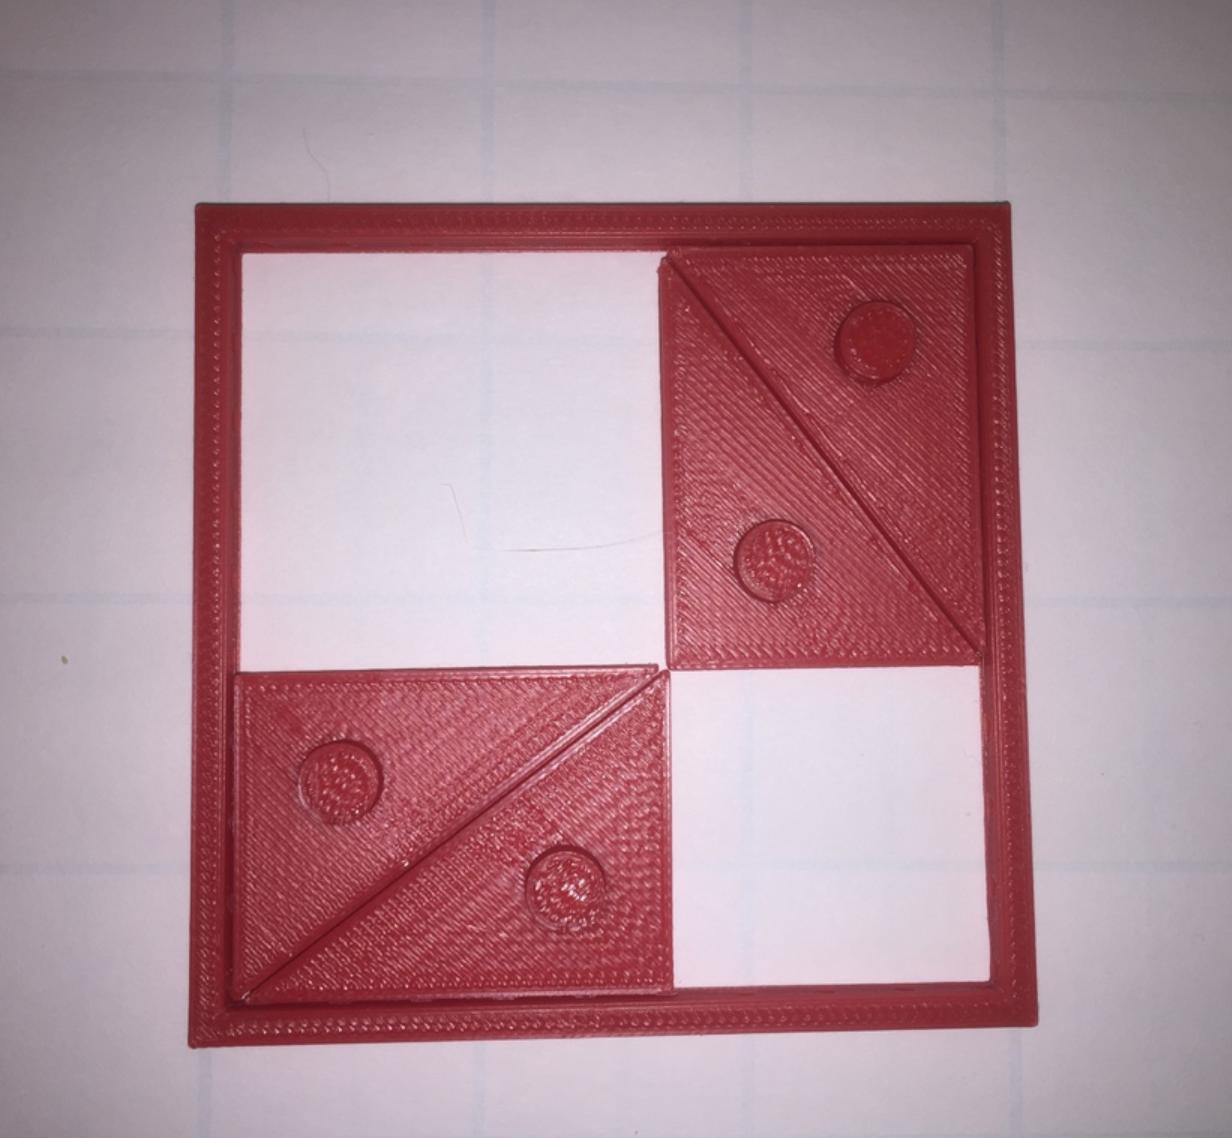 Capture d'écran 2017-12-26 à 15.09.20.png Download free STL file Pythagorean Theorem, Visual Proof, Chinese Origin • 3D printer template, LGBU